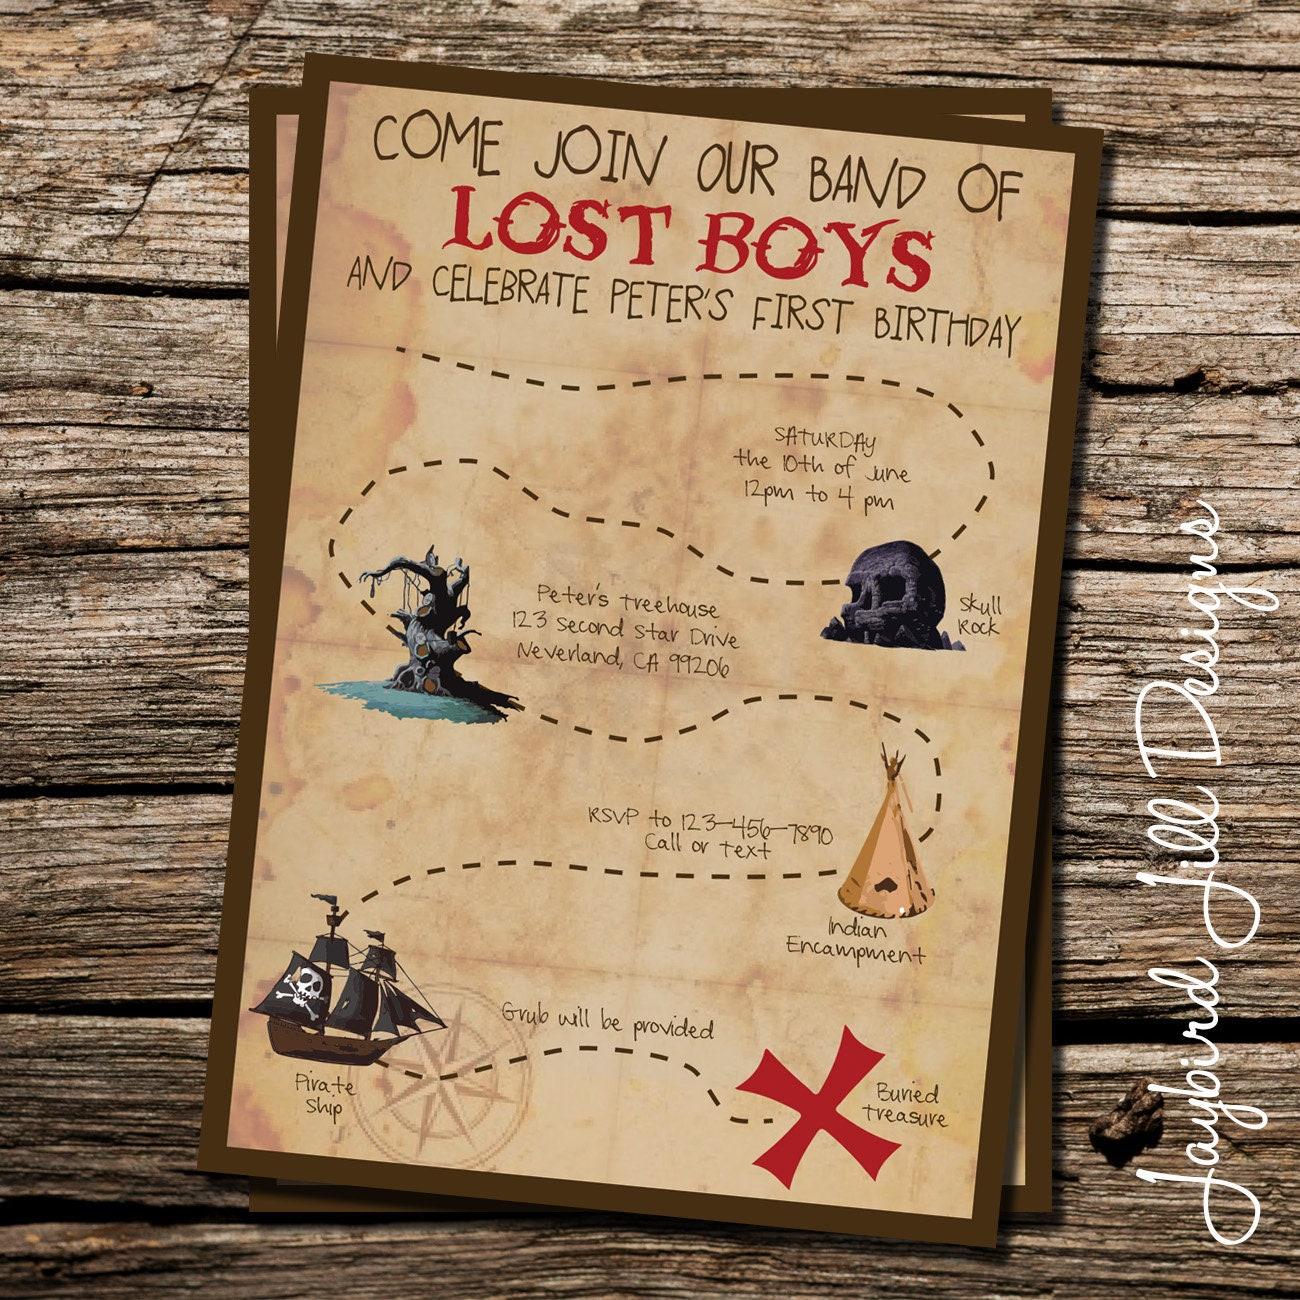 Lost Boys Birthday Invitation / Peter Pan Neverland Party /